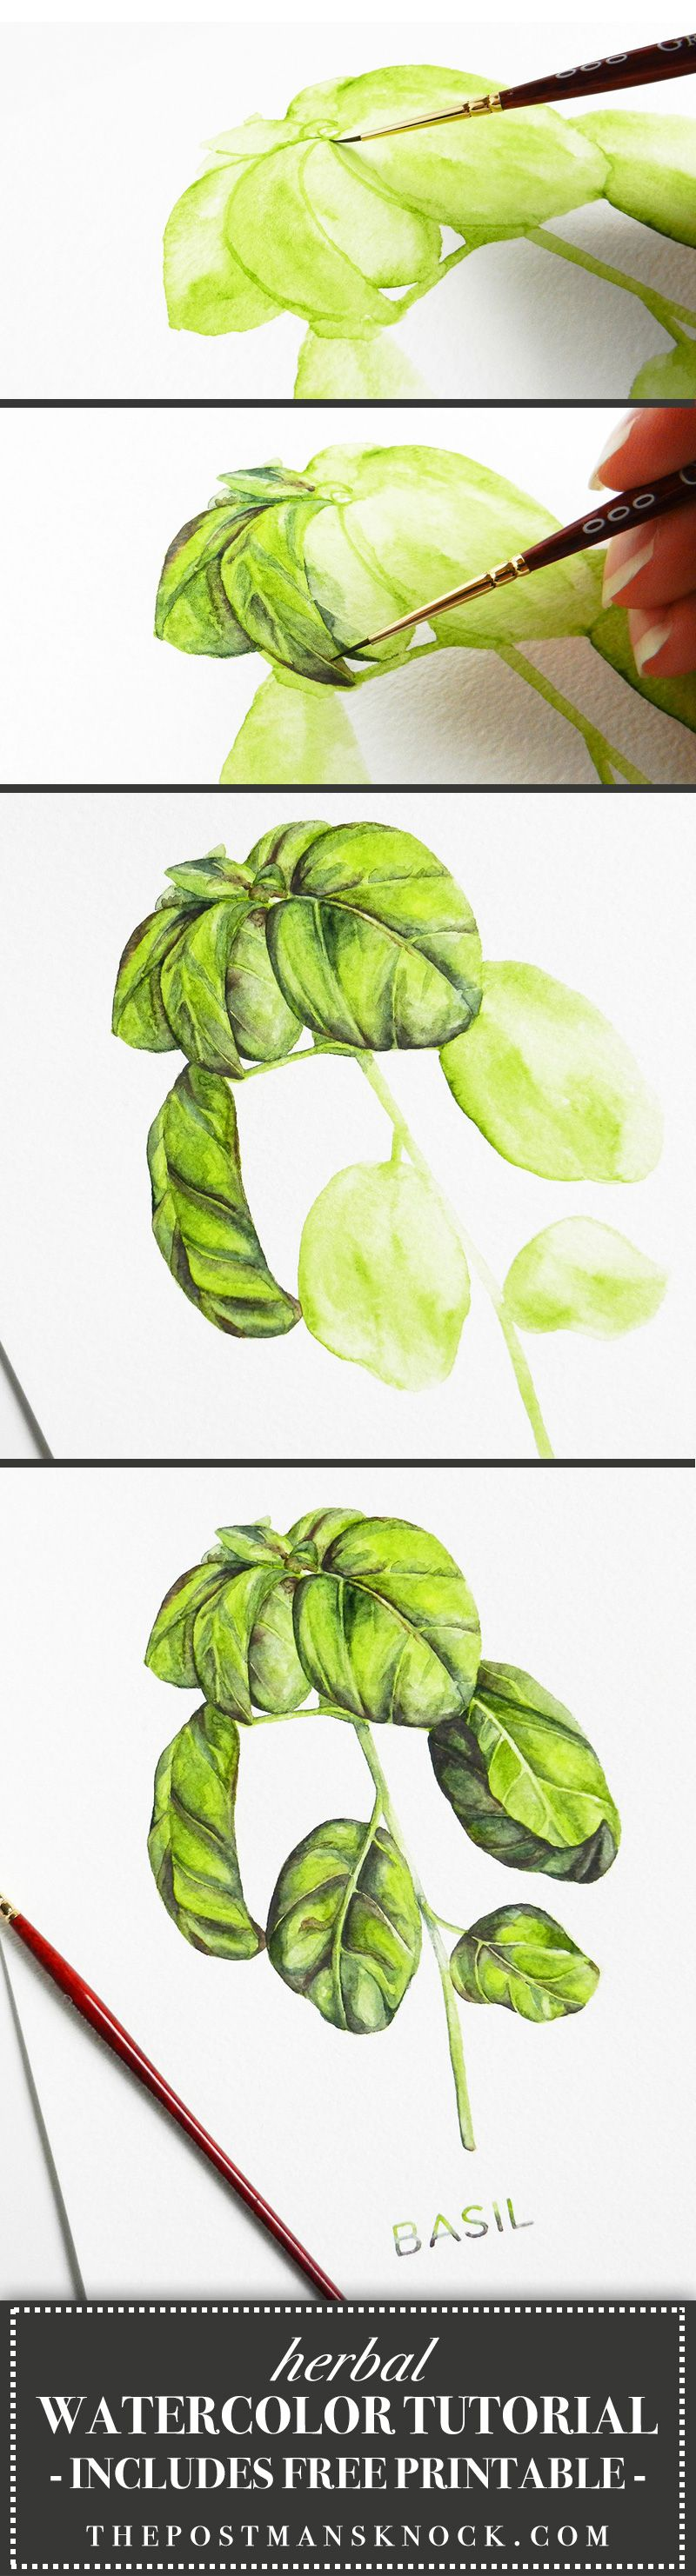 Herbal Watercolor Tutorial A Free Printable Watercolour